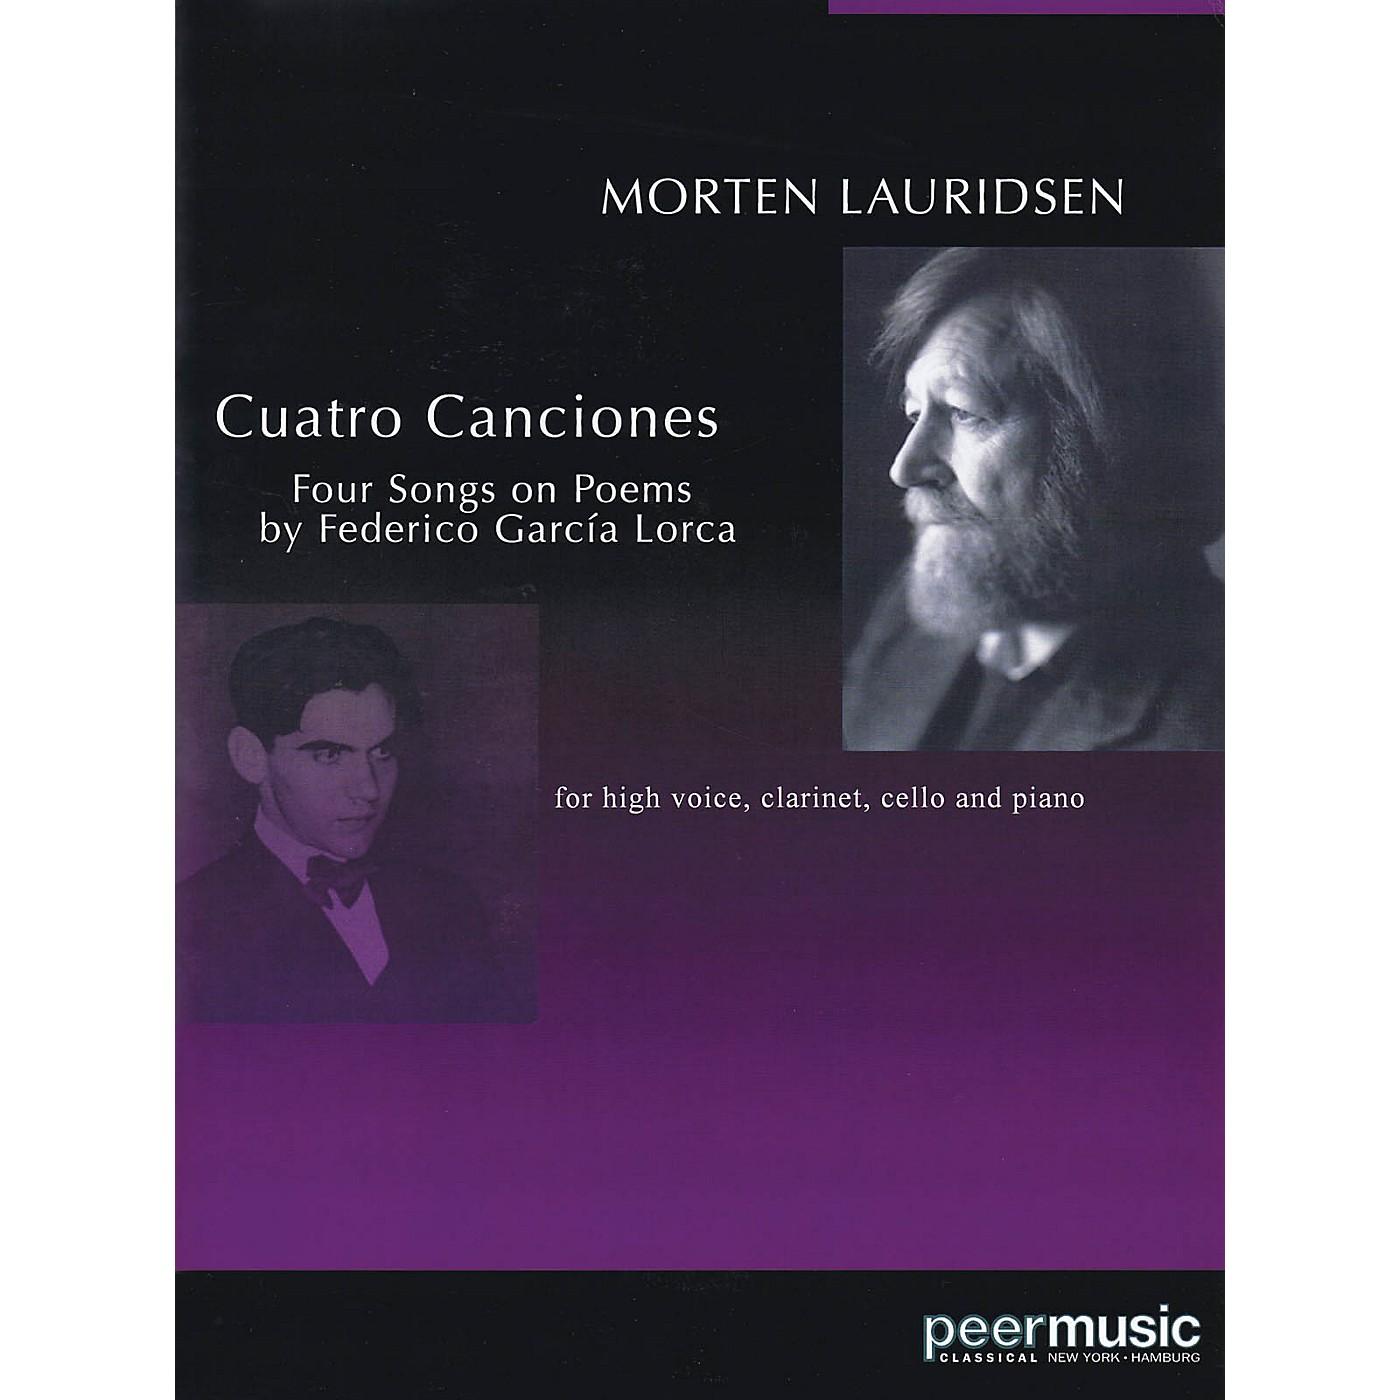 Peer Music Cuatro Canciones (for Soprano, Clarinet, Cello and Piano) Peermusic Classical Series by Morten Lauridsen thumbnail